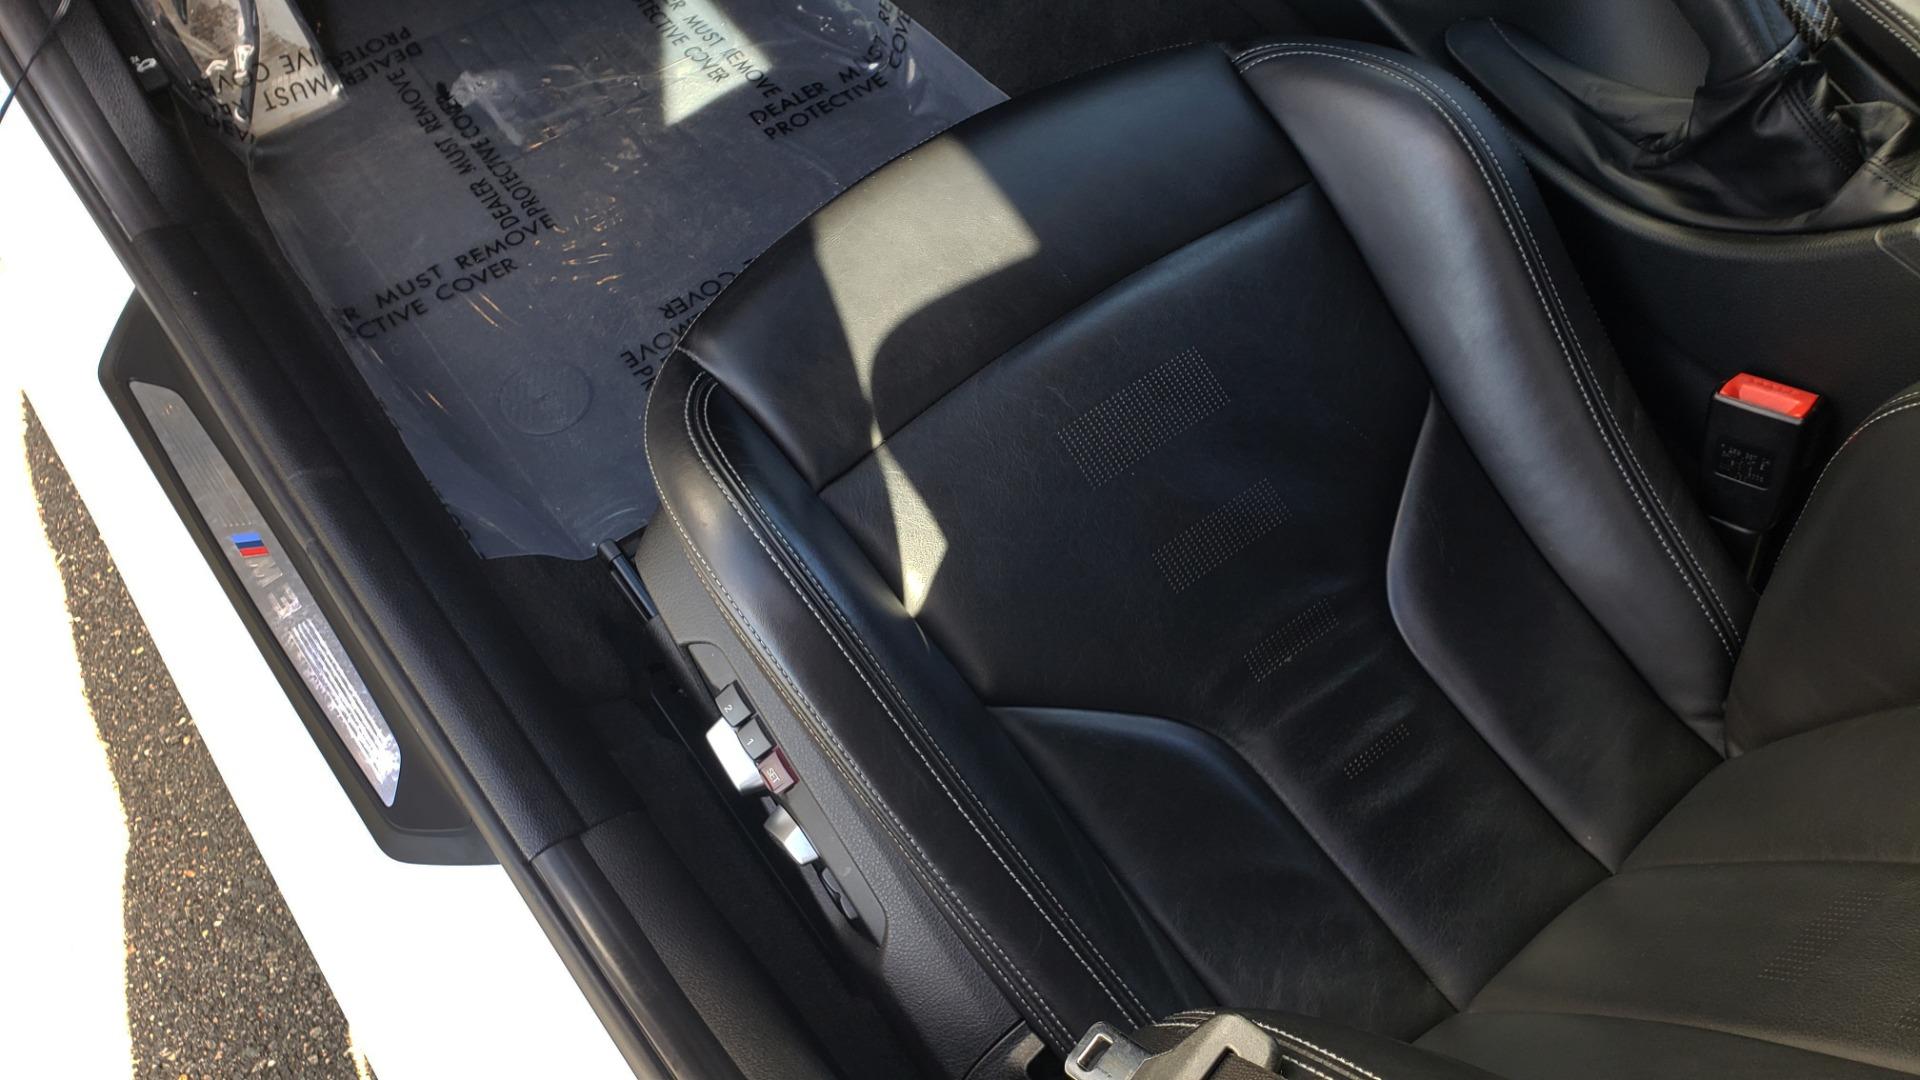 Used 2016 BMW M3 SEDAN / EXECUTIVE PKG / M-SUSPENSION / HARMAN/KARDON SOUND for sale Sold at Formula Imports in Charlotte NC 28227 37